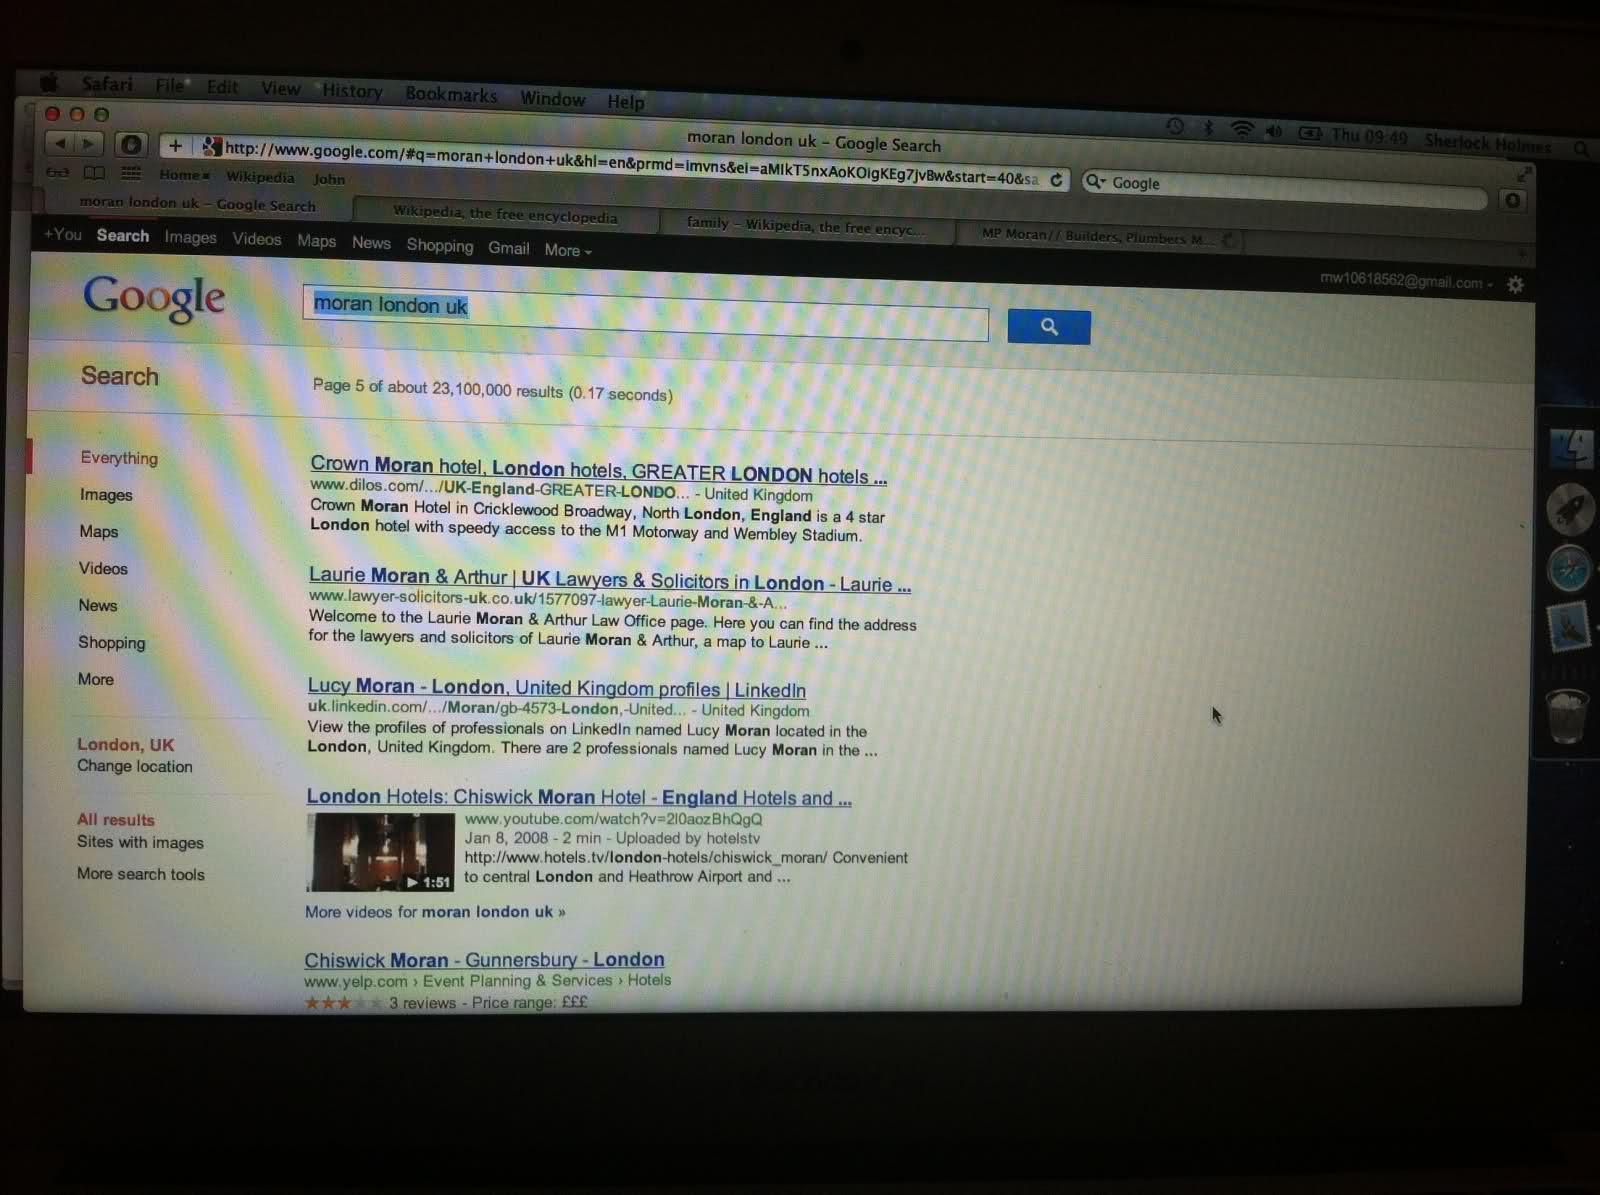 Google search: 'moran london uk' - page 5